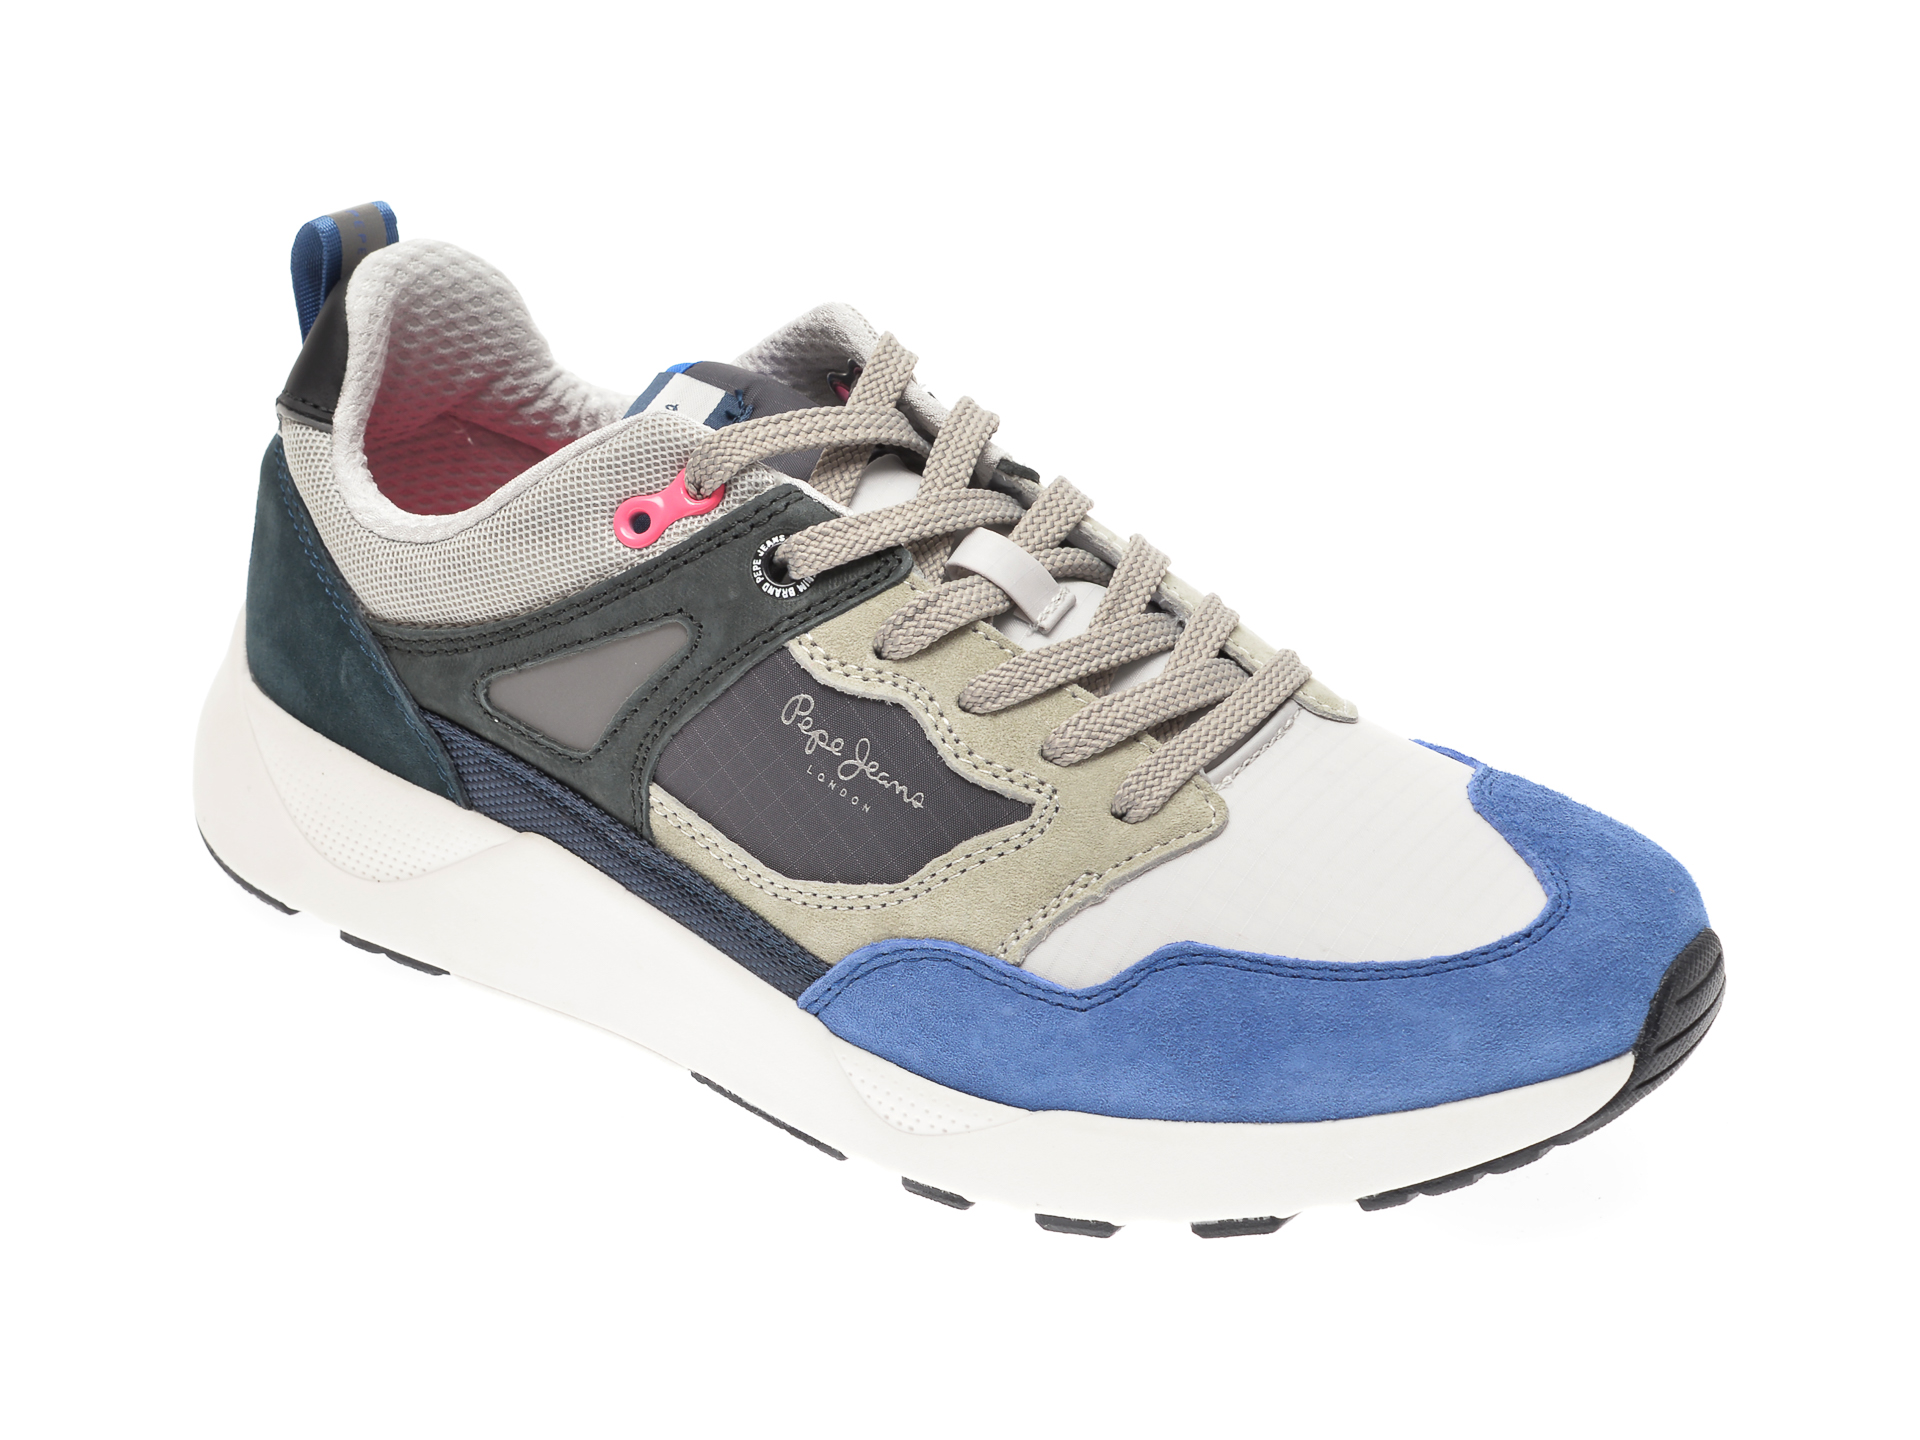 Pantofi Sport Pepe Jeans Albastri, Ms30598, Din Material Textil